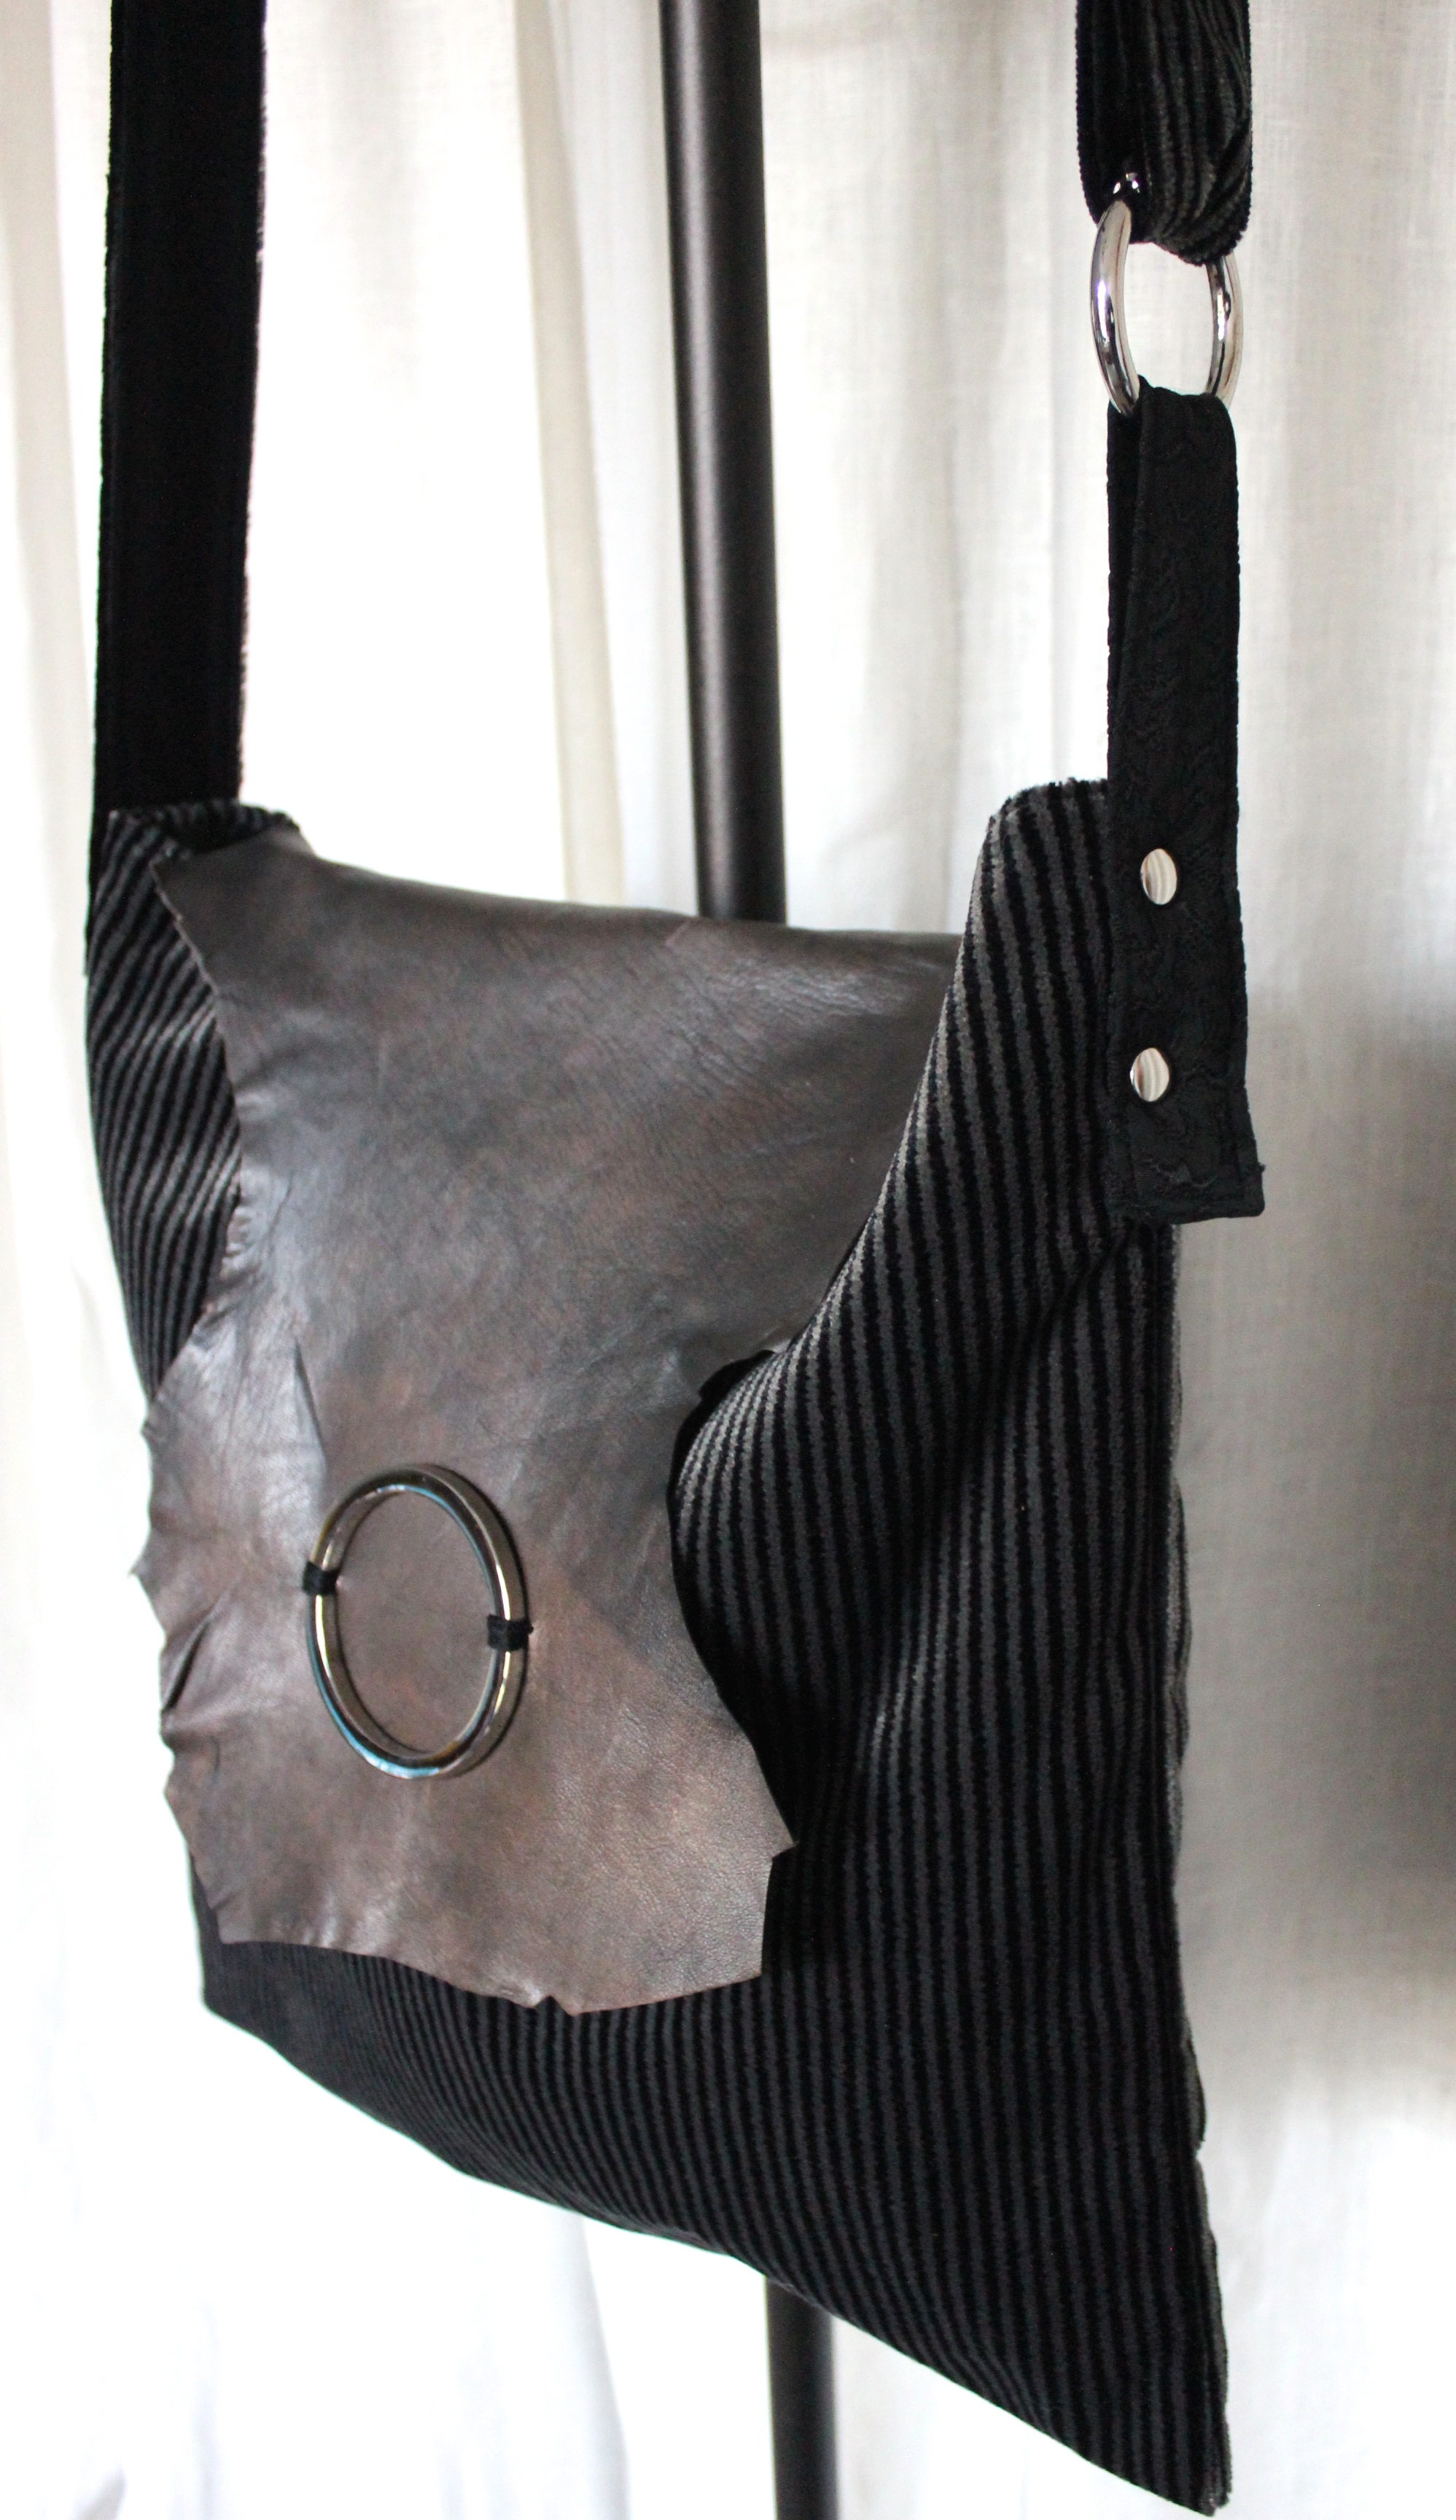 Borse Artigianali Tessuto : Le tangueras borse di tessuto fatte a mano tekoa milano